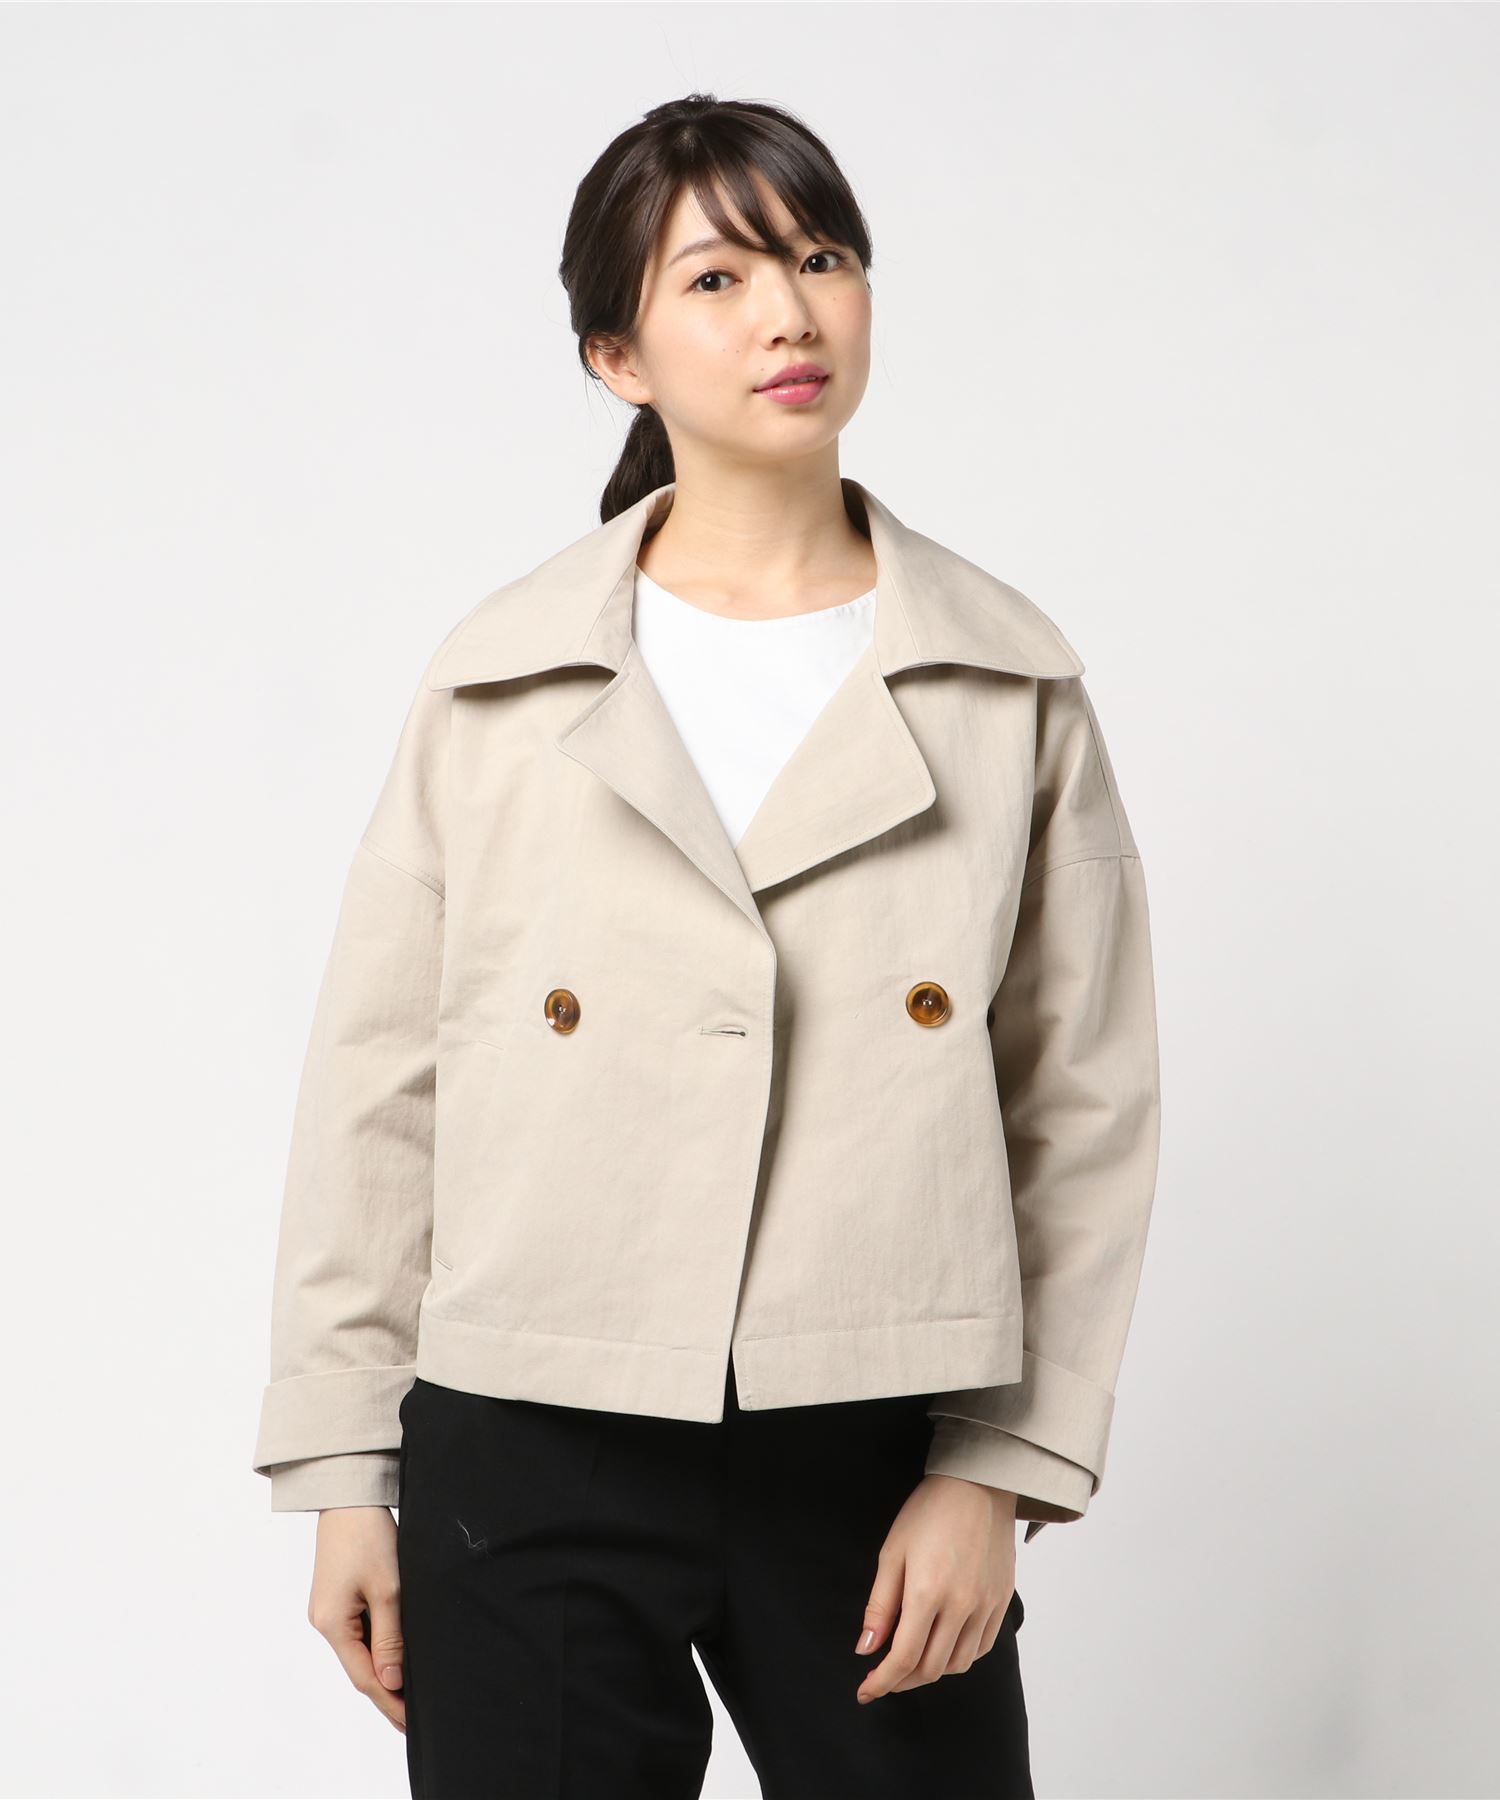 AERON エアロン / ショート丈ジャケット